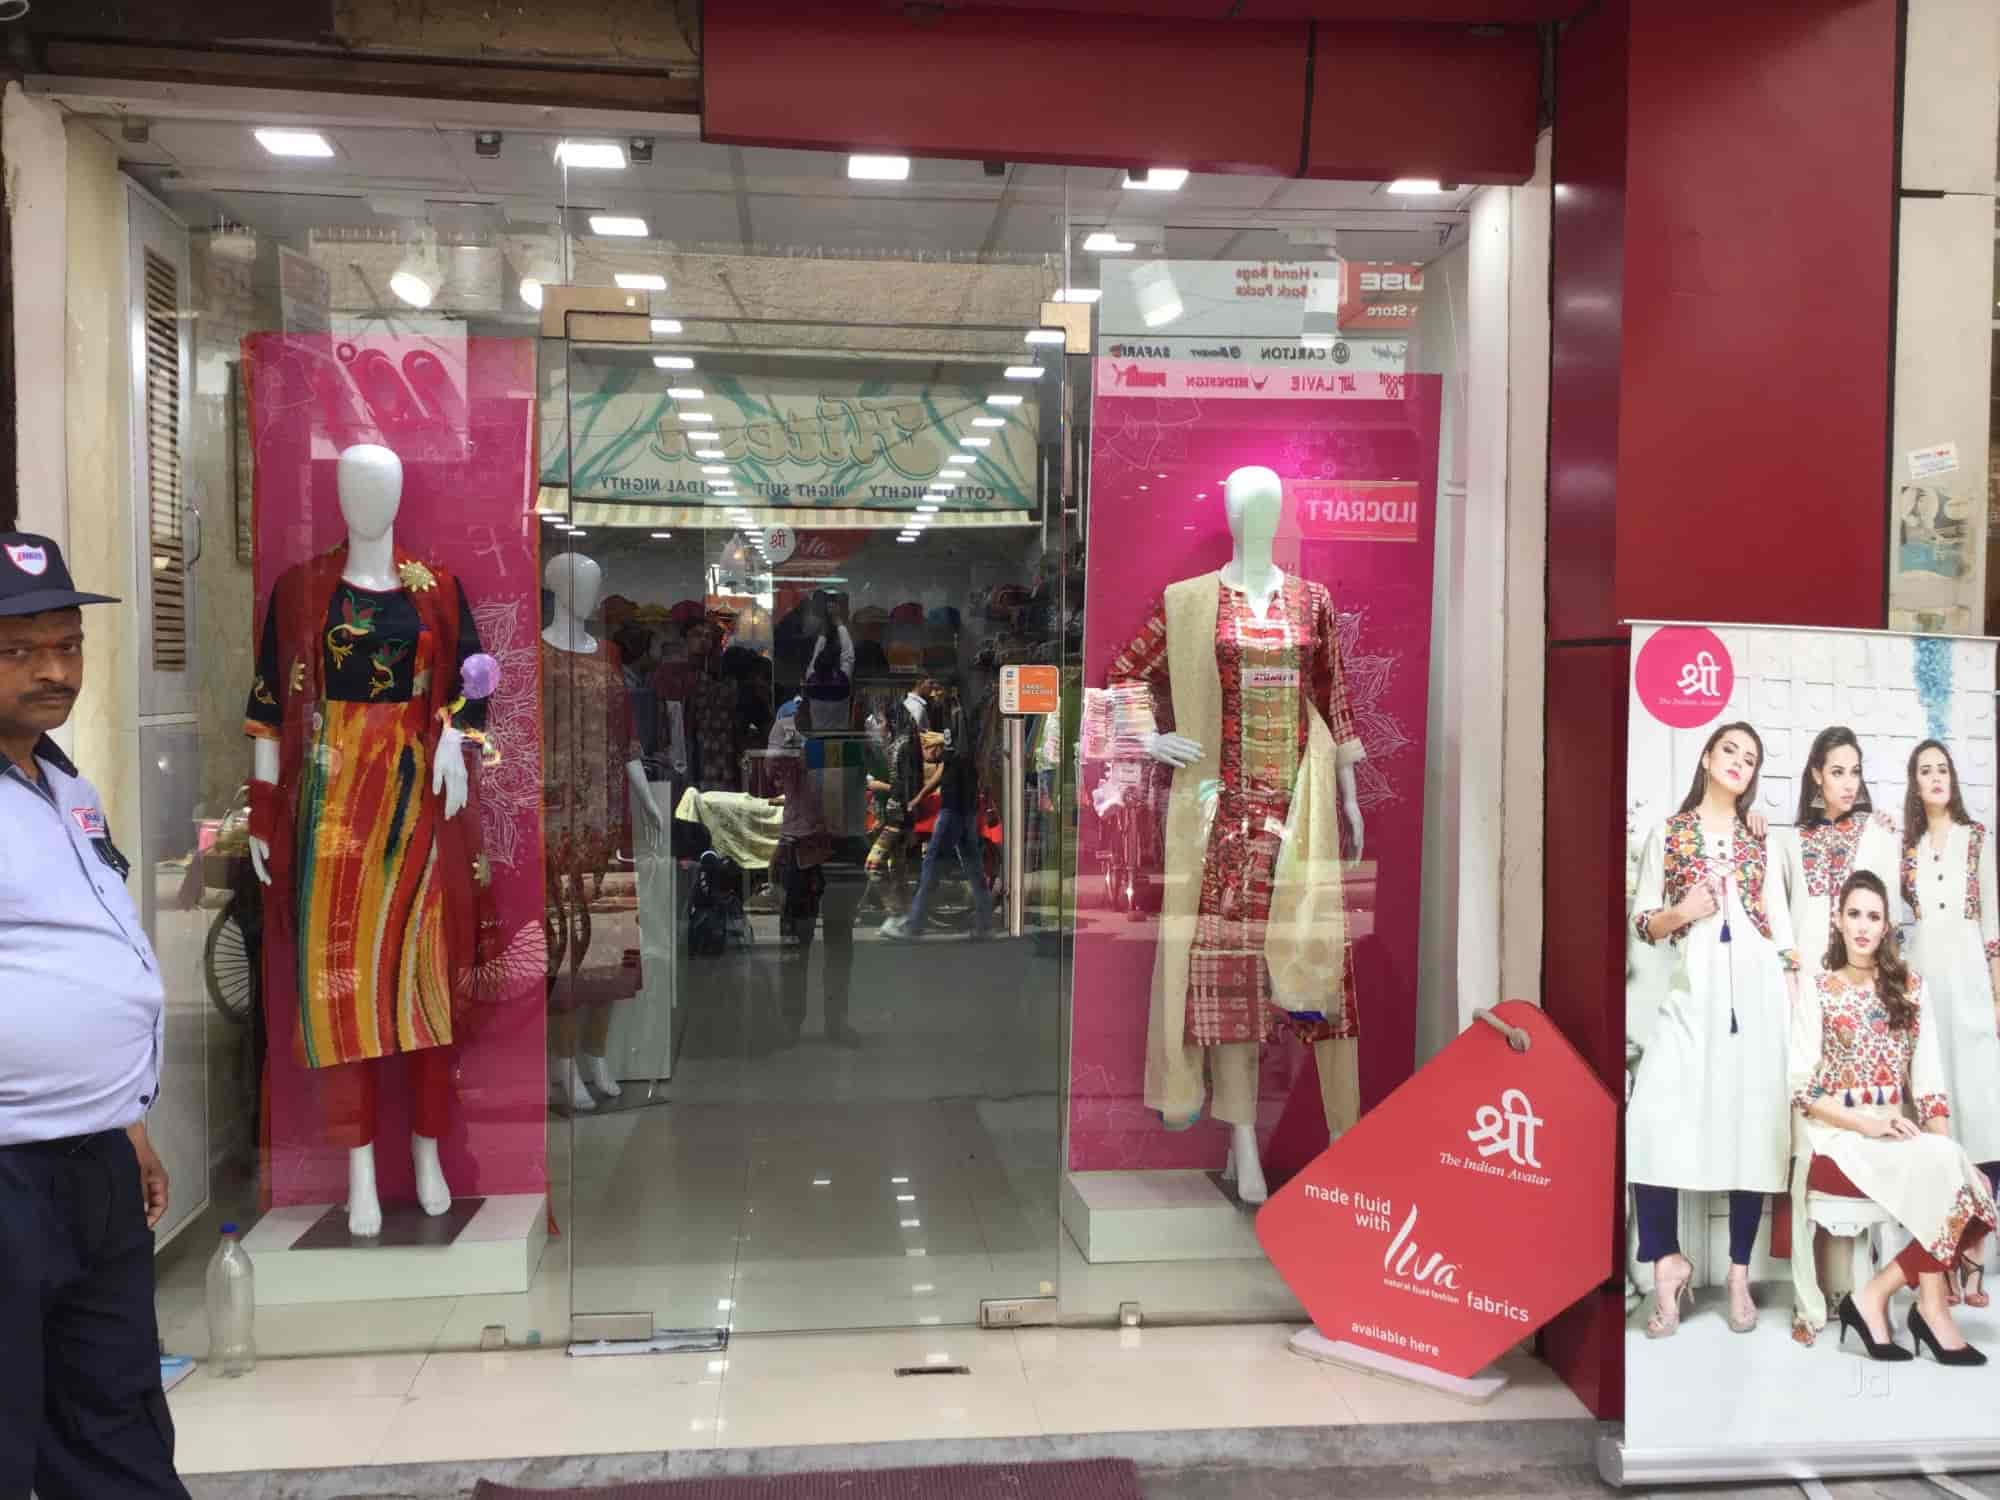 d508c88f91 Shree The Indian Avatar, Kamla Nagar - Women Ethnic Wear Retailers in Delhi  - Justdial